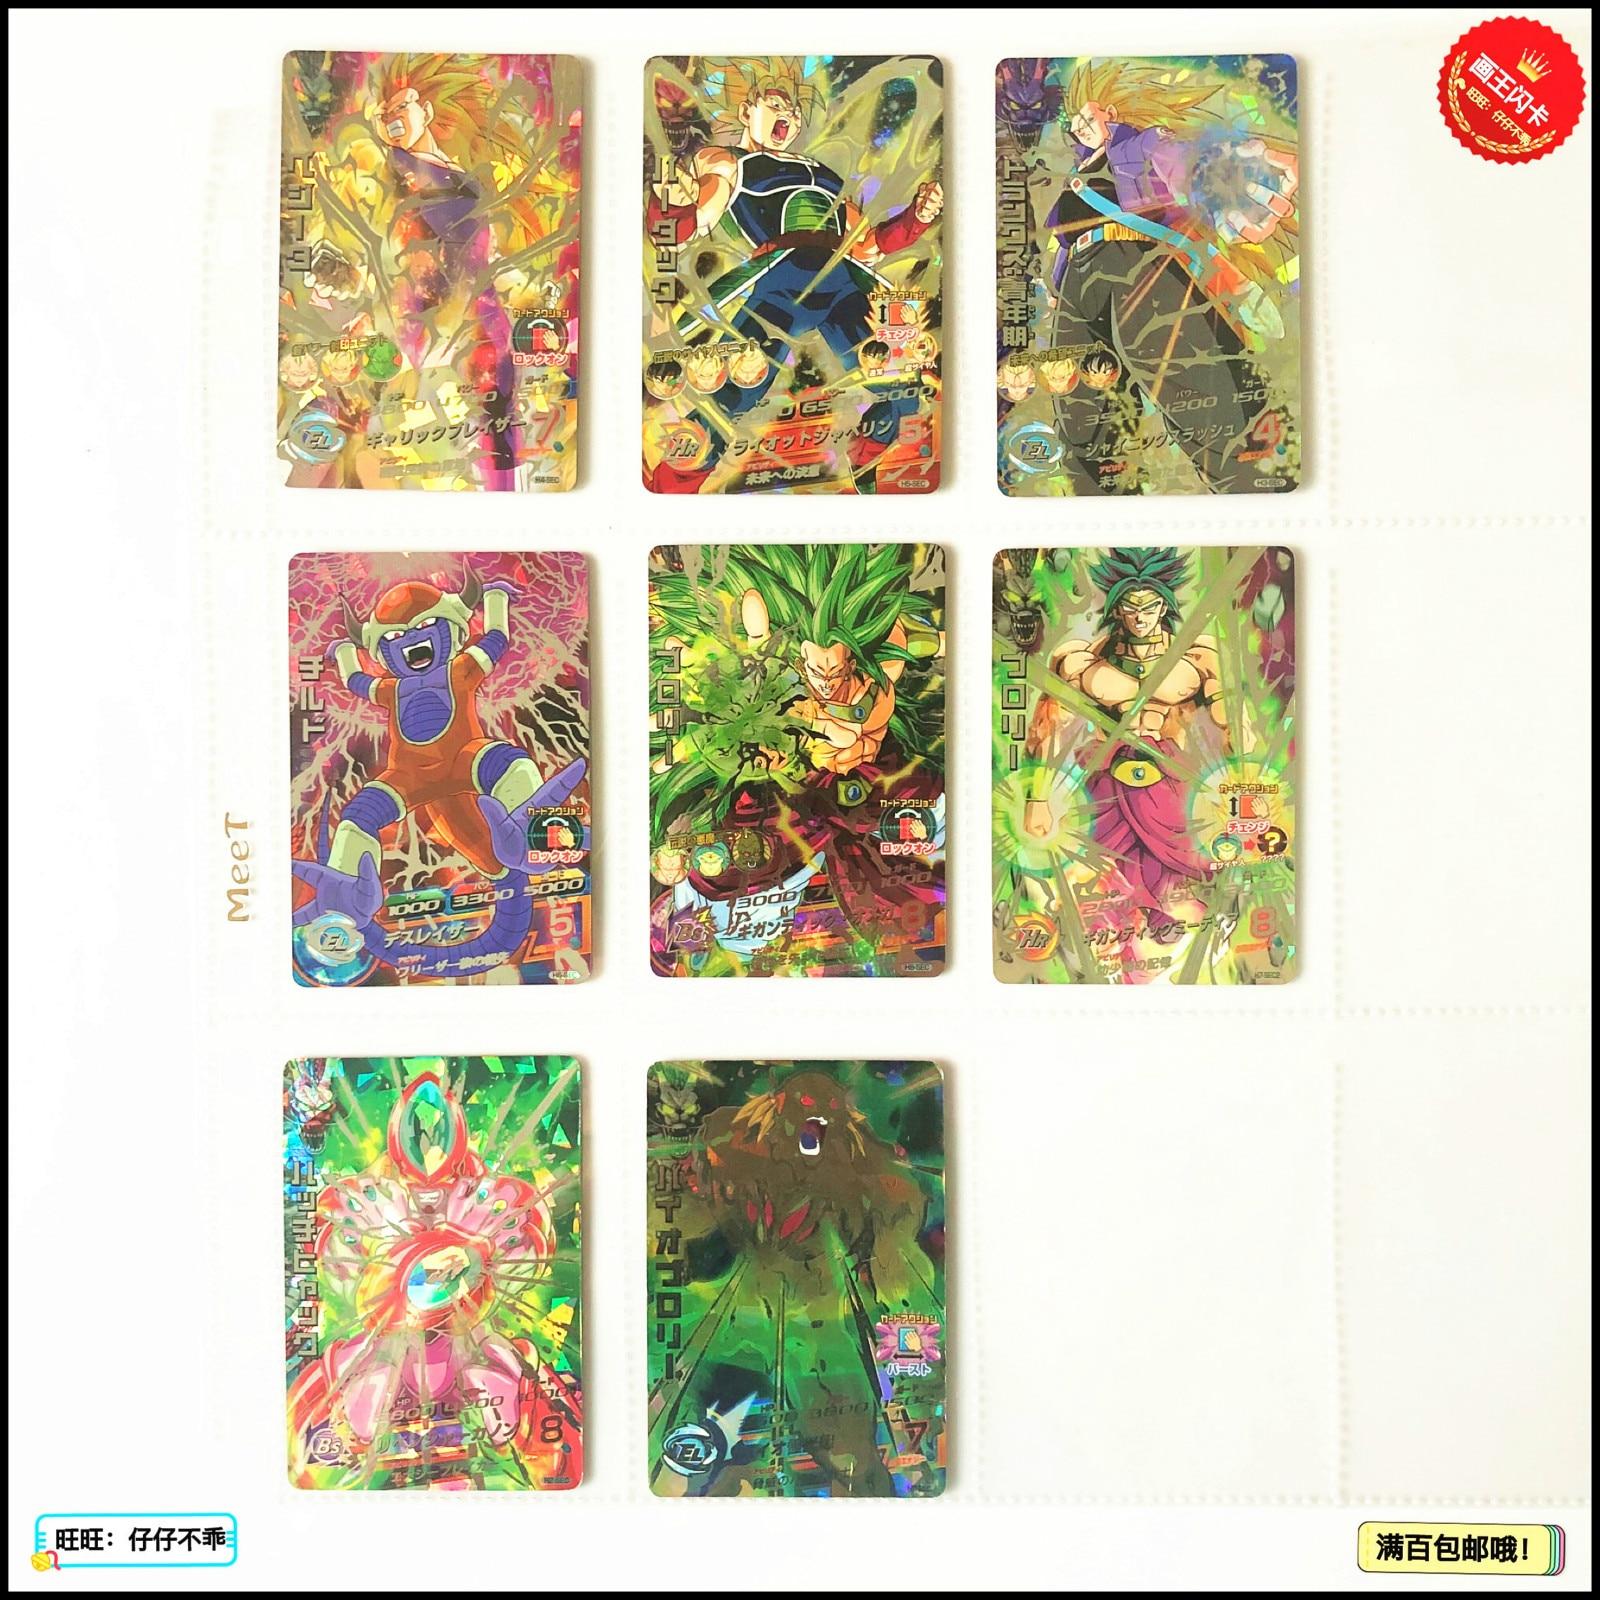 Japan Original Dragon Ball Hero Card 4 Stars H.HJ.HG SEC Goku Toys Hobbies Collectibles Game Collection Anime Cards